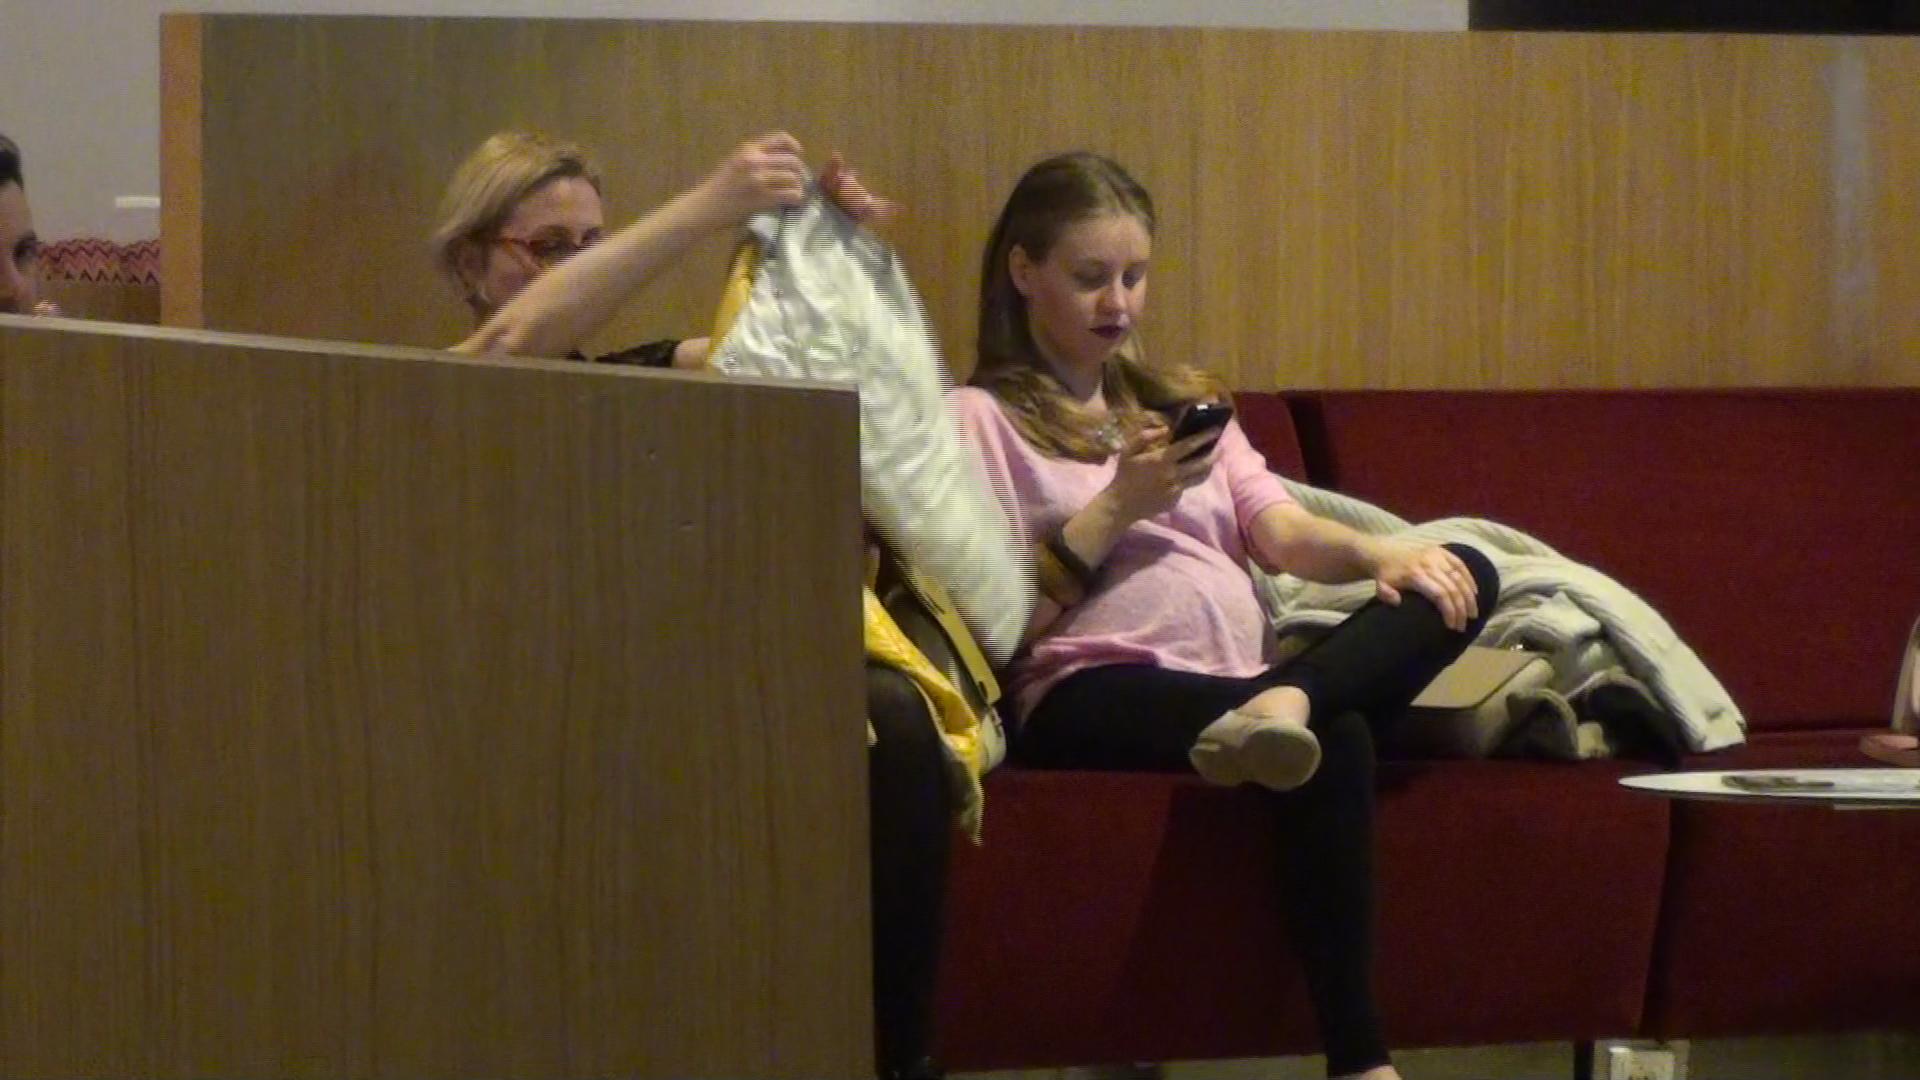 Oana a stat cuminte pe o canapea, timp in care jurnalistul Robert Turcescu s-a dus sa cumpere biletele la film